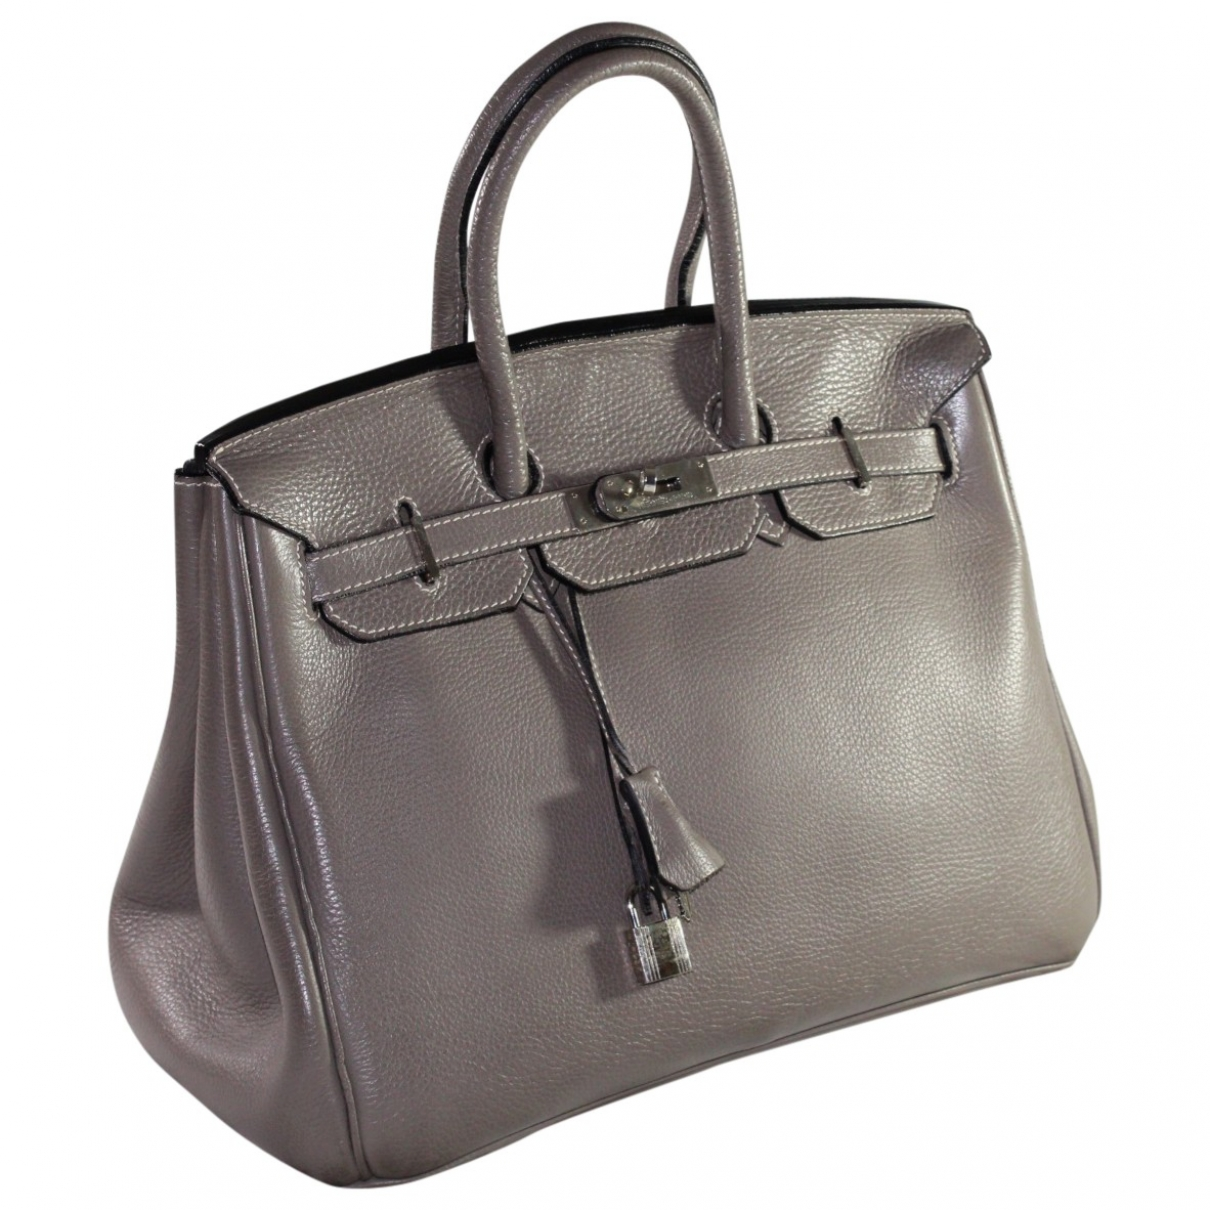 Hermes - Sac a main Birkin 40 pour femme en cuir - gris